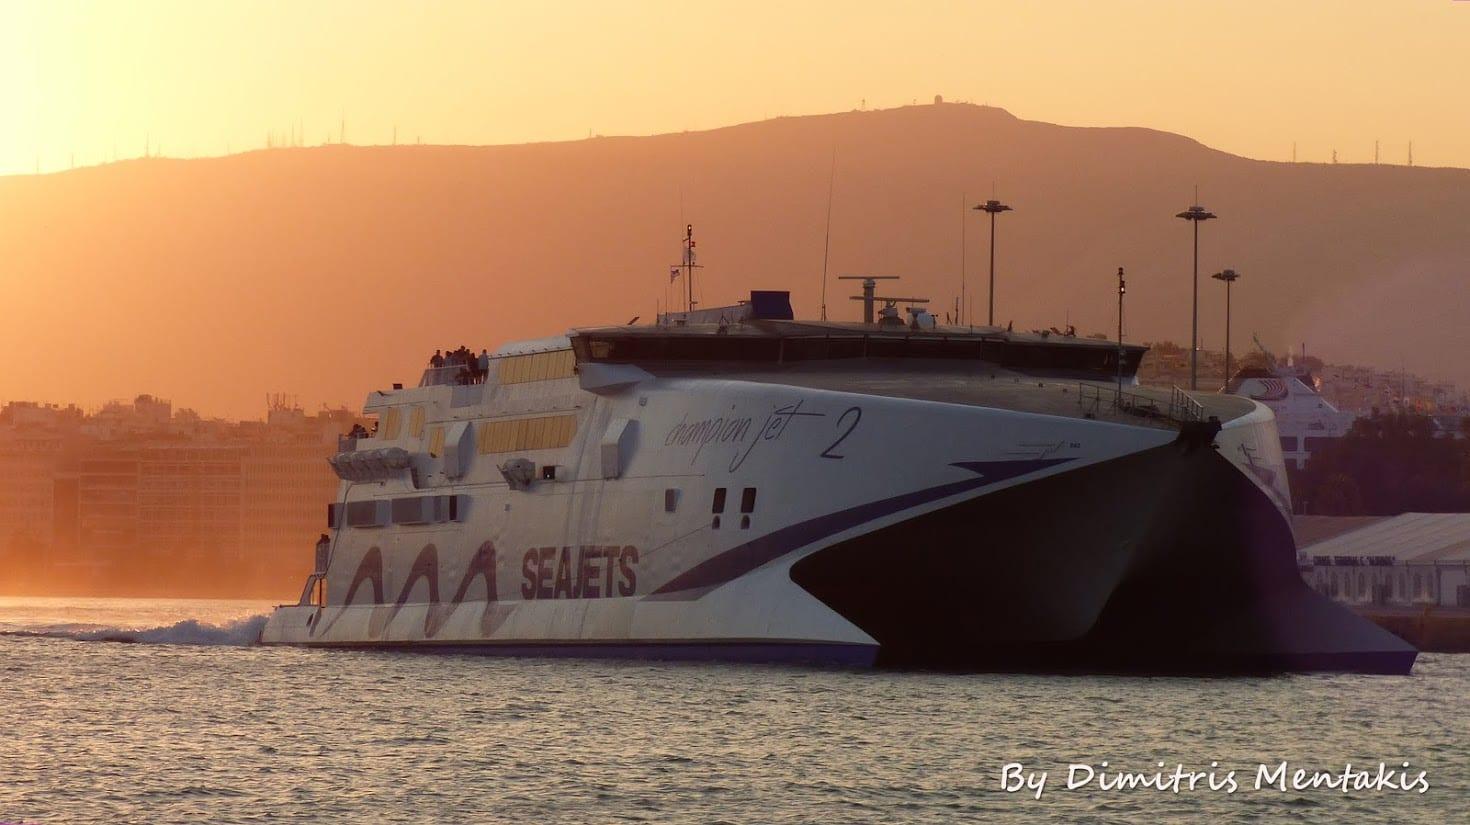 Seajets Champion Jet 2 Mykonos to Santorini ferry